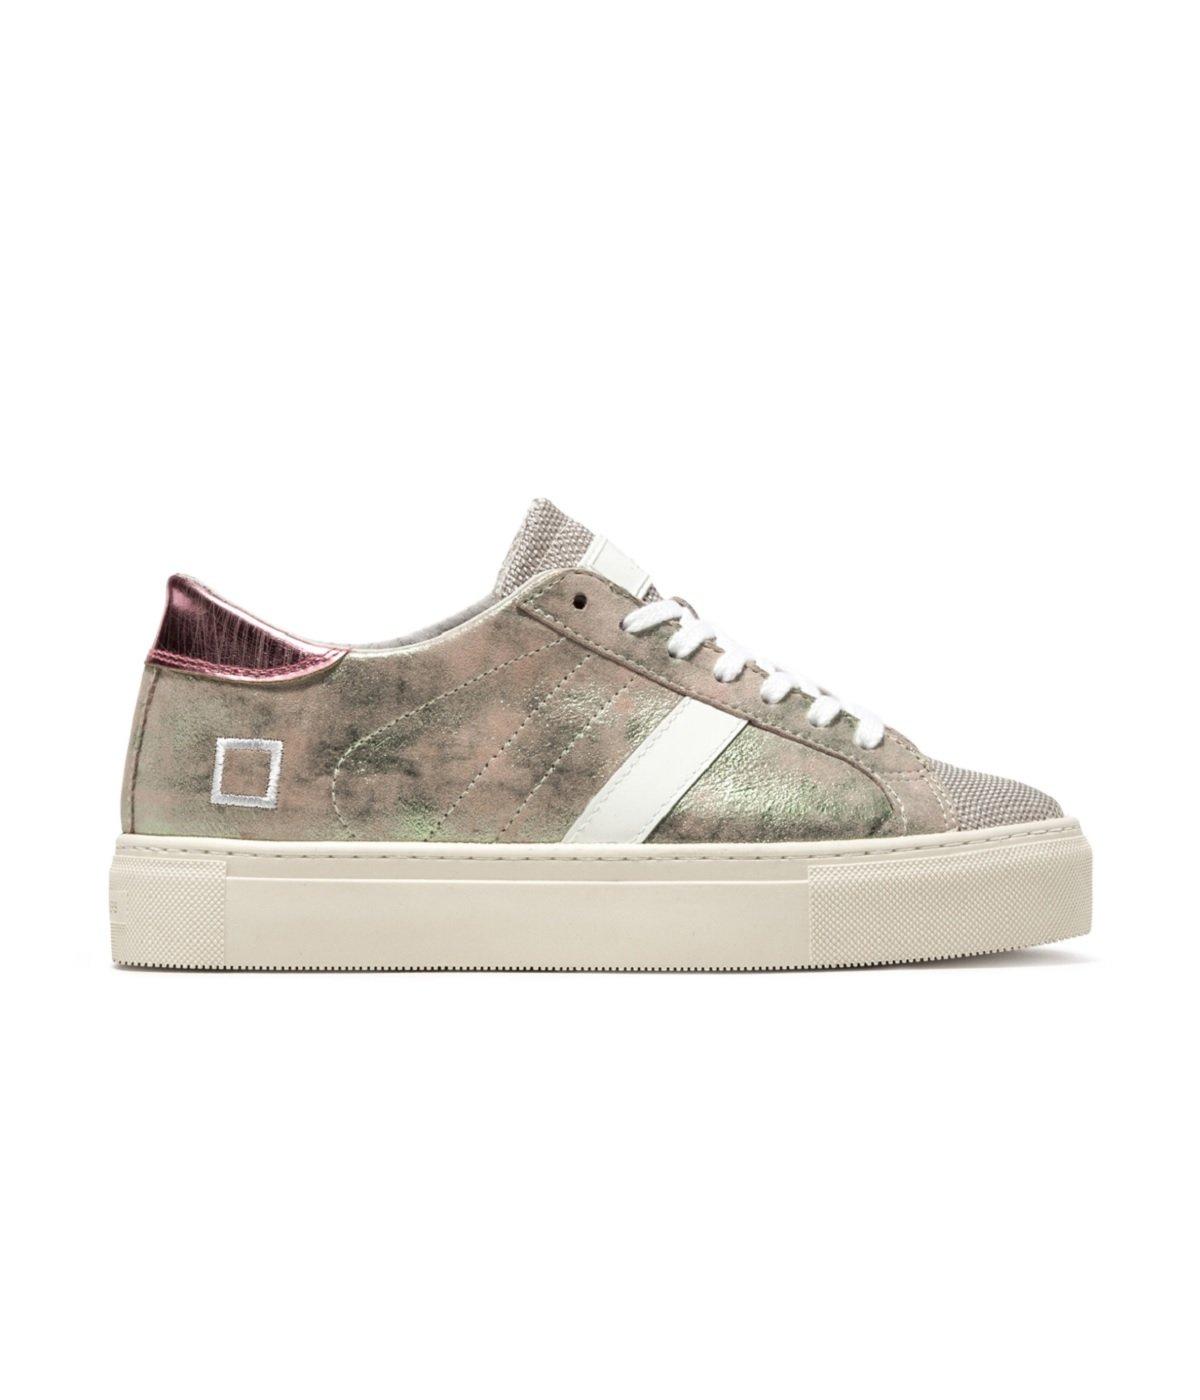 Sneaker D.A.T.E. Vertigo Stardust en Piel laminada Rosa y Verde 37 EU Rosa